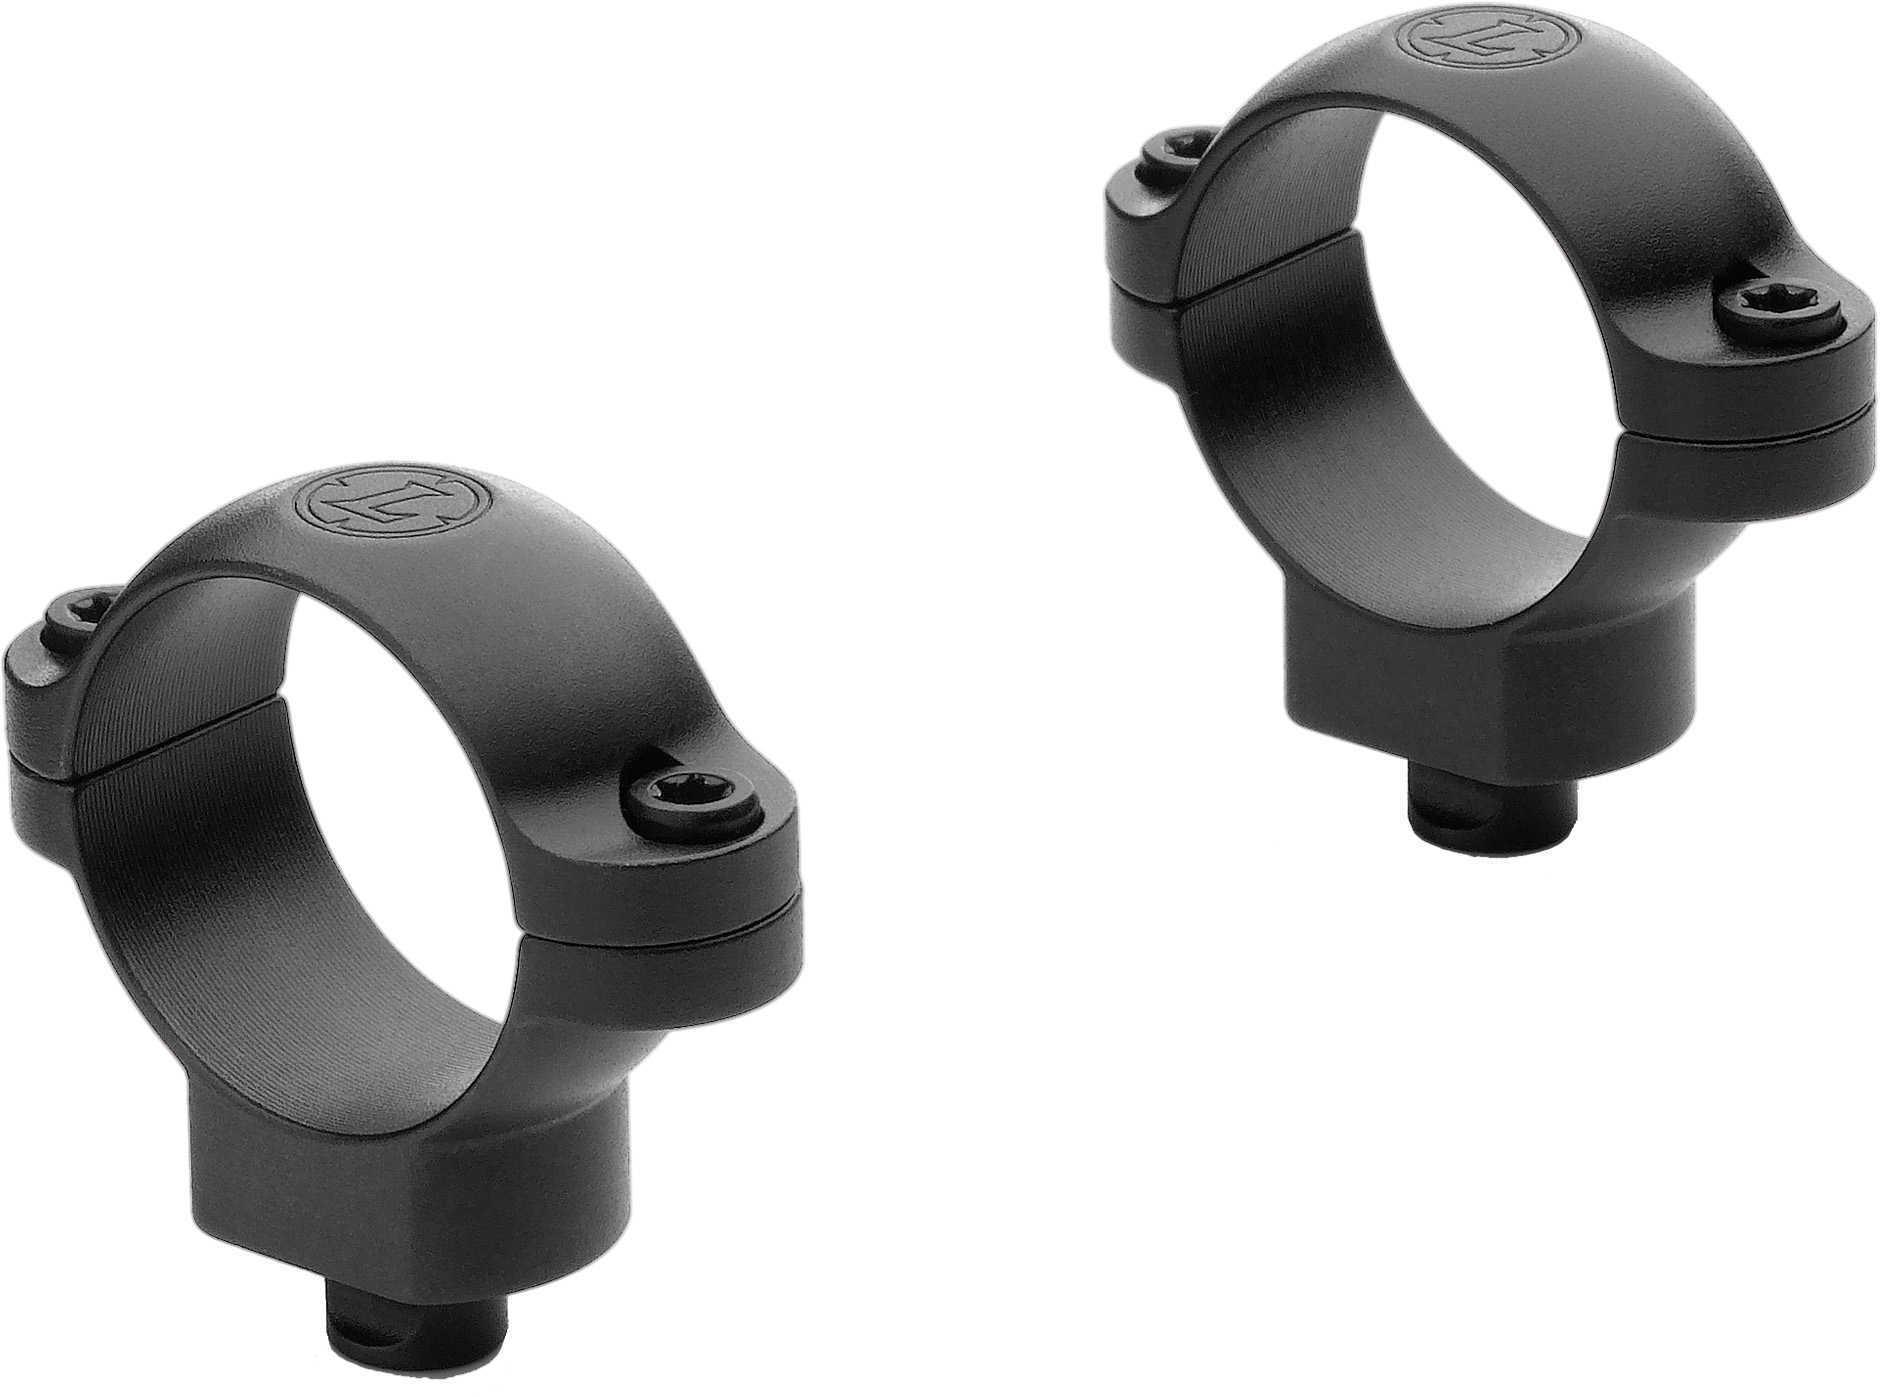 Leupold Quick Release 30mm Rings Medium Black Md: 49930